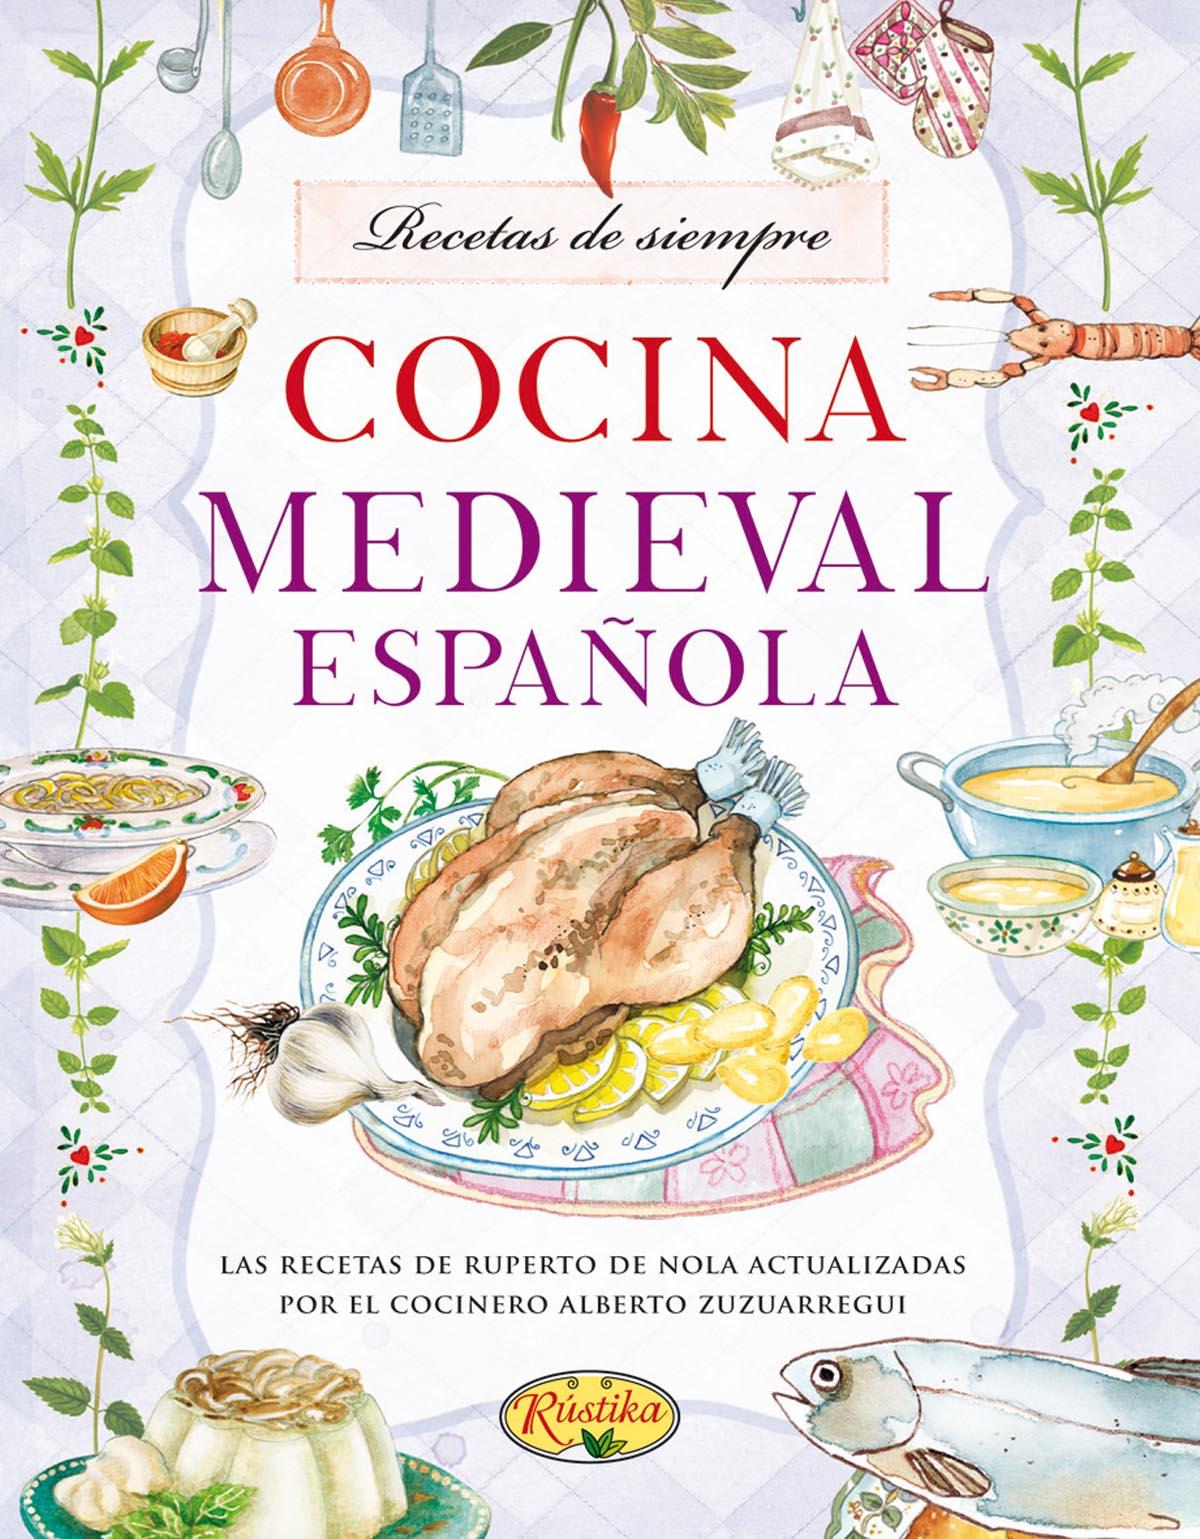 Libros de cocina gastronoma ca recetas de cocina rustika for Libros de cocina gratis